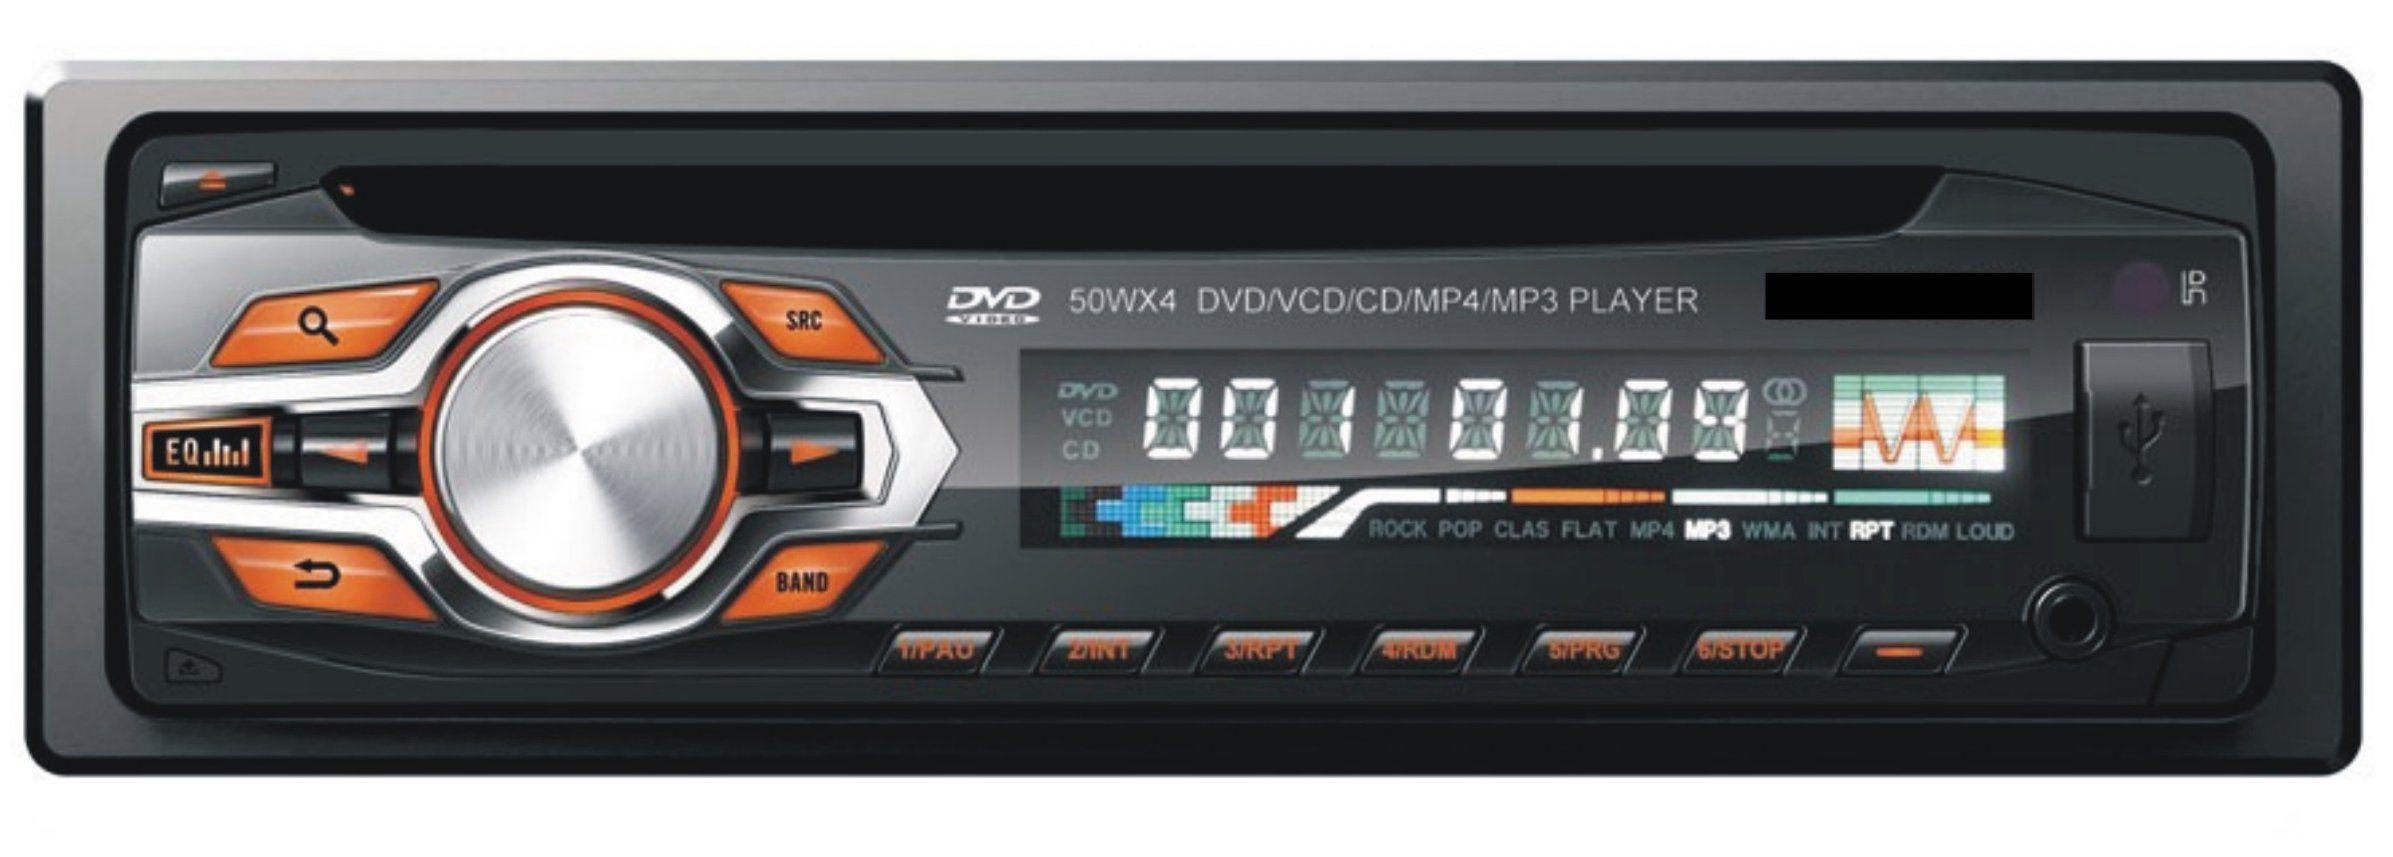 FM/USB/SD/Aux in/DVD/CD/VCD/ID3/WMA/MP4/MP3 Detachable Auto DVD Player Car Amplifier Radio